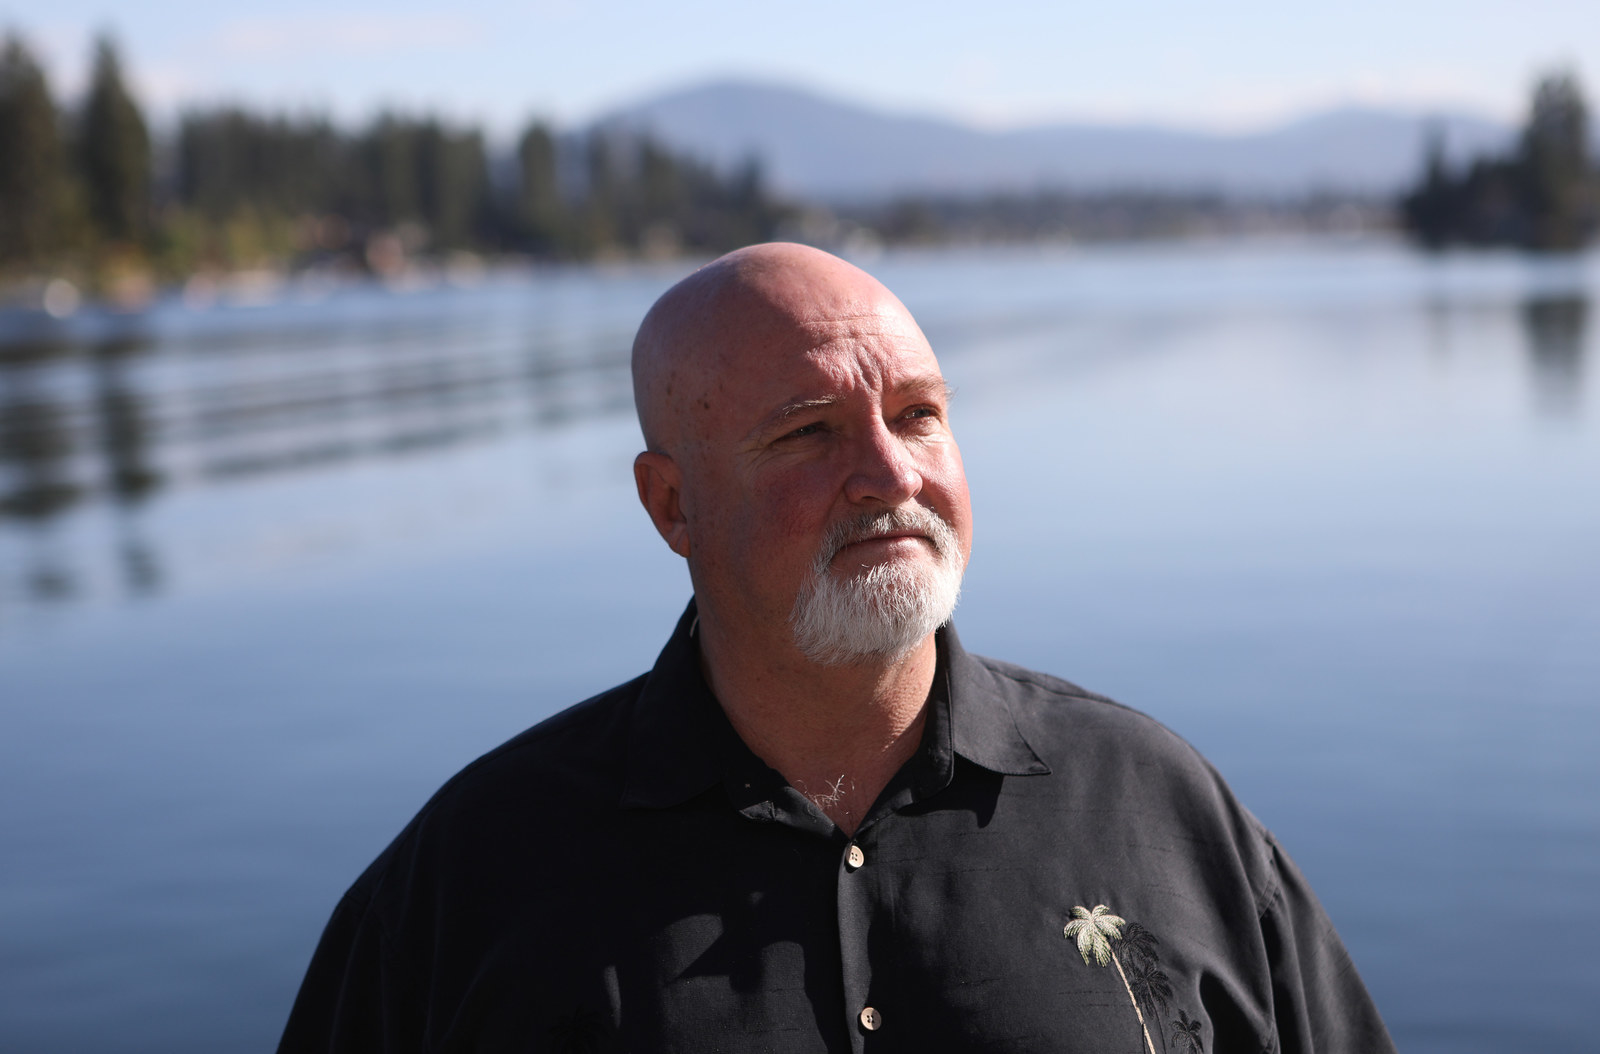 Kootenai ID Single Men Over 50